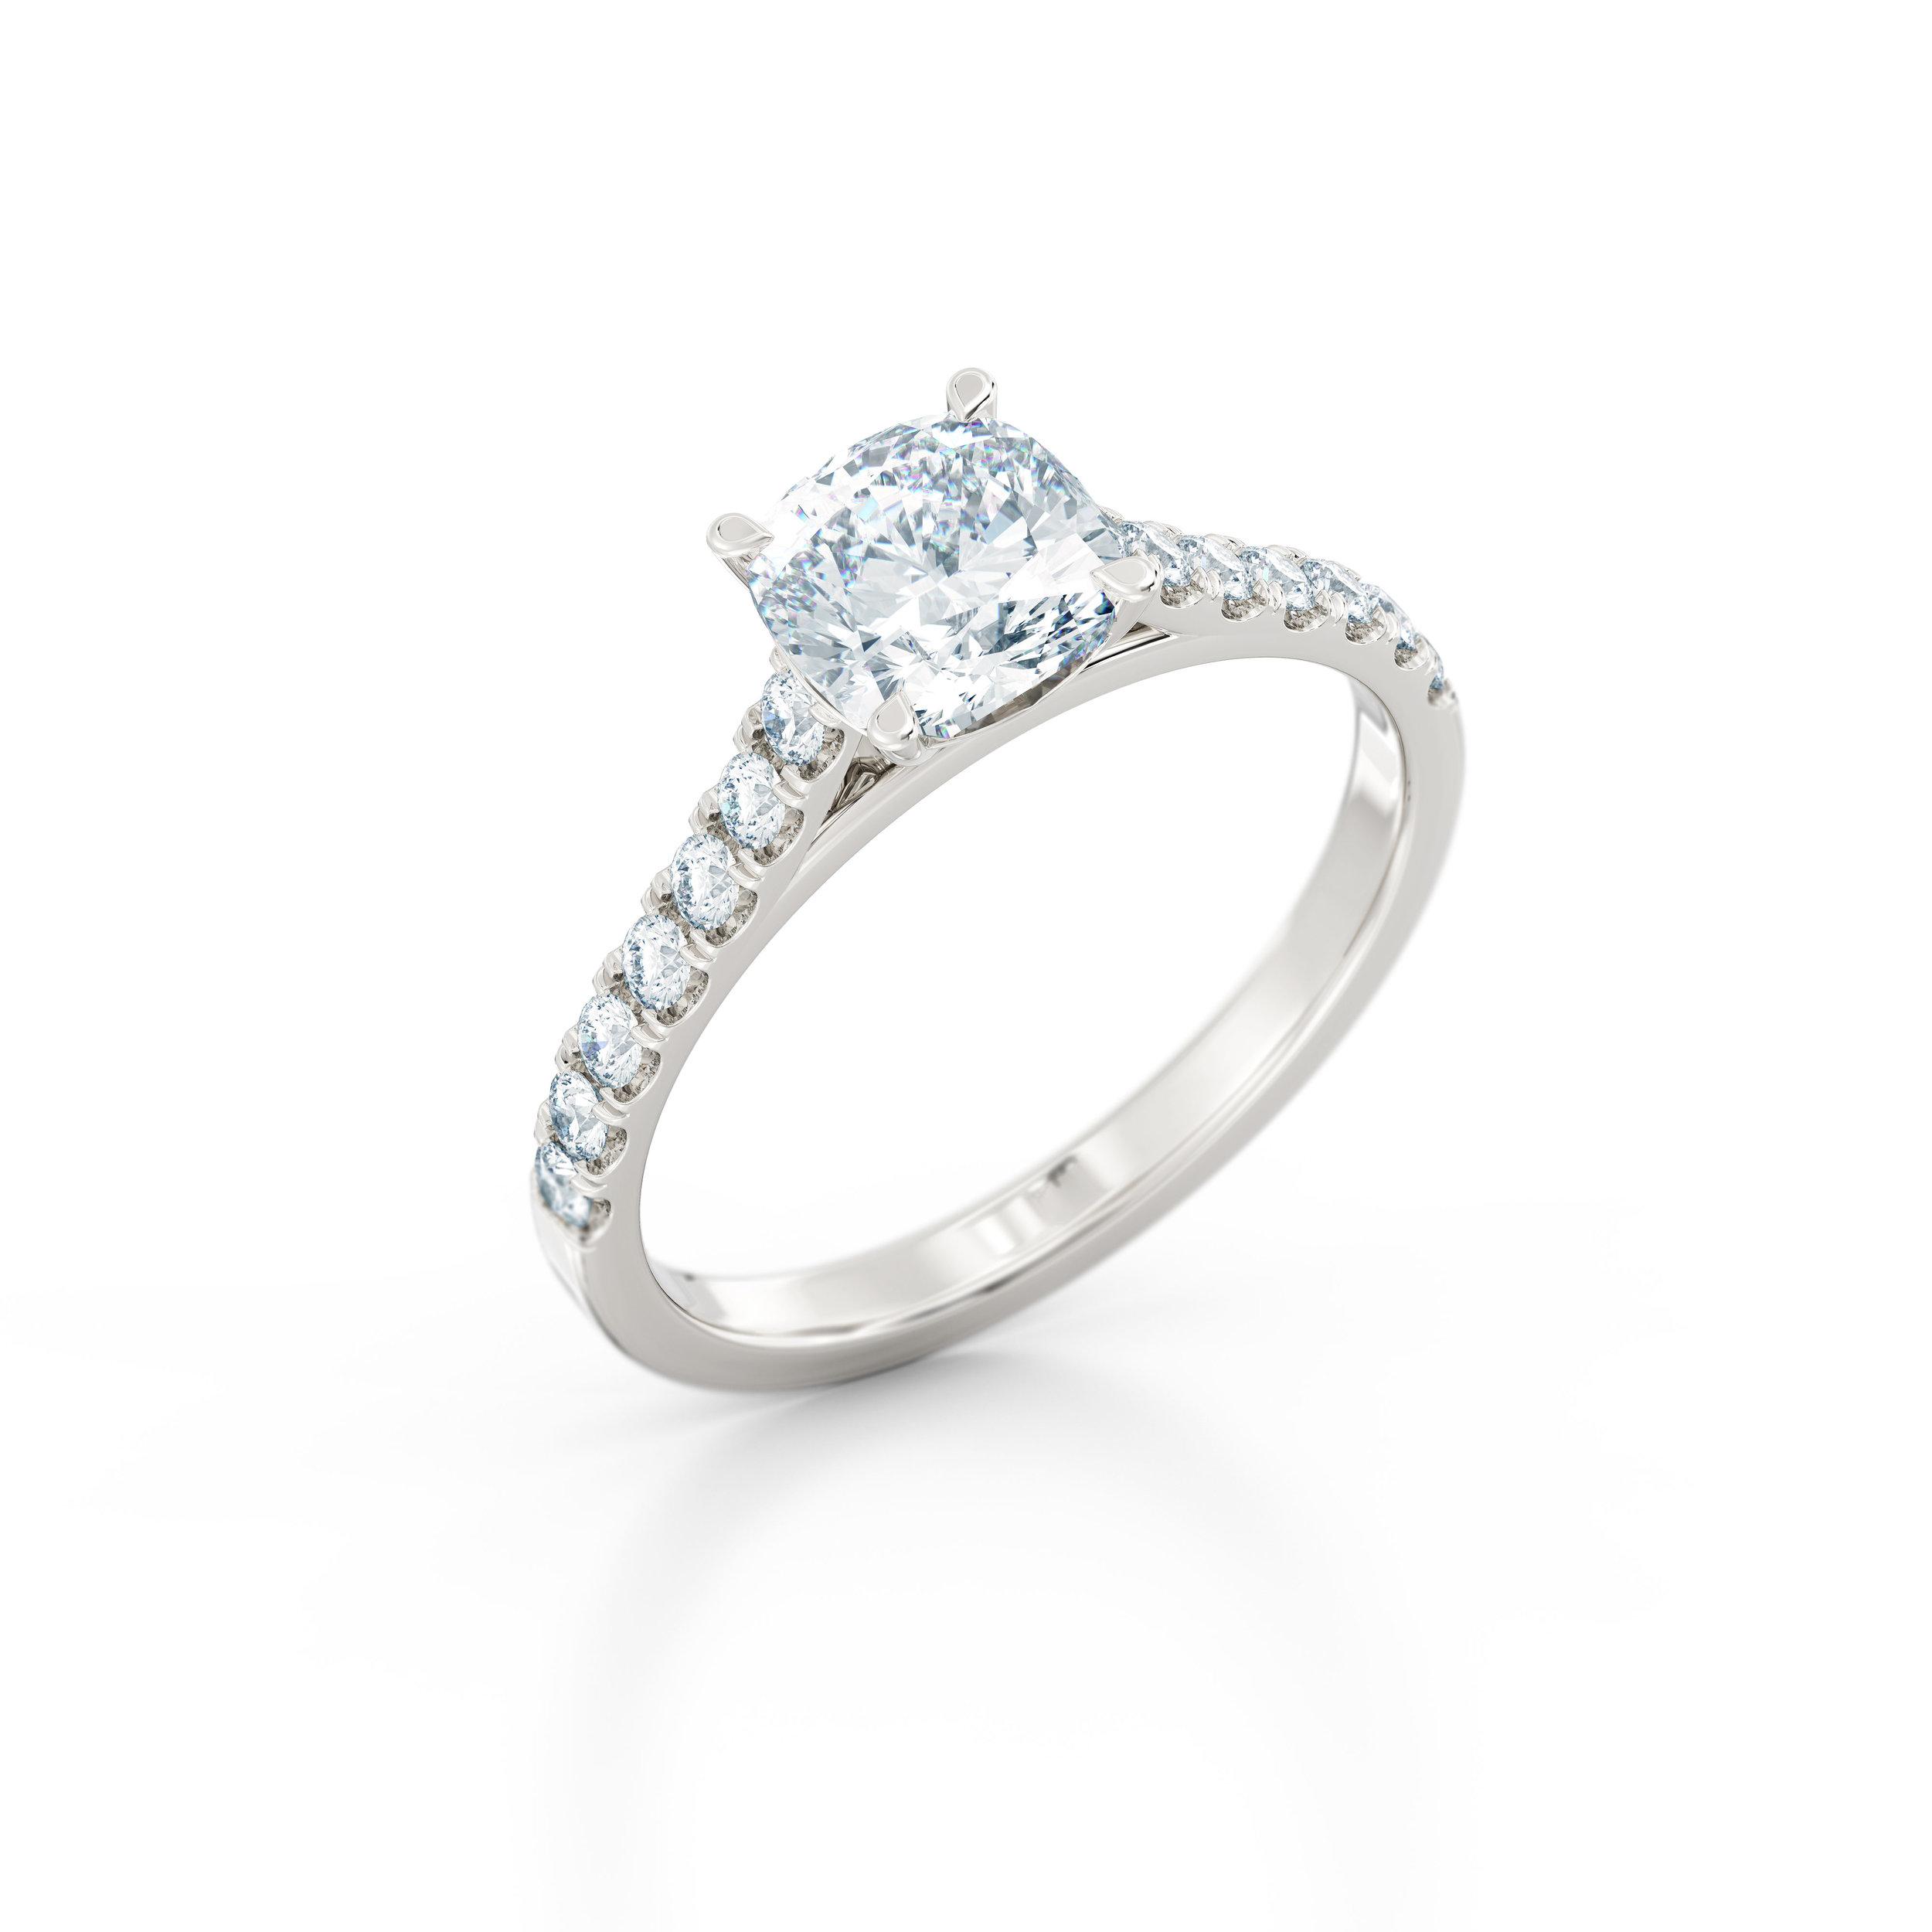 Cushion cut diamond shoulder engagement ring